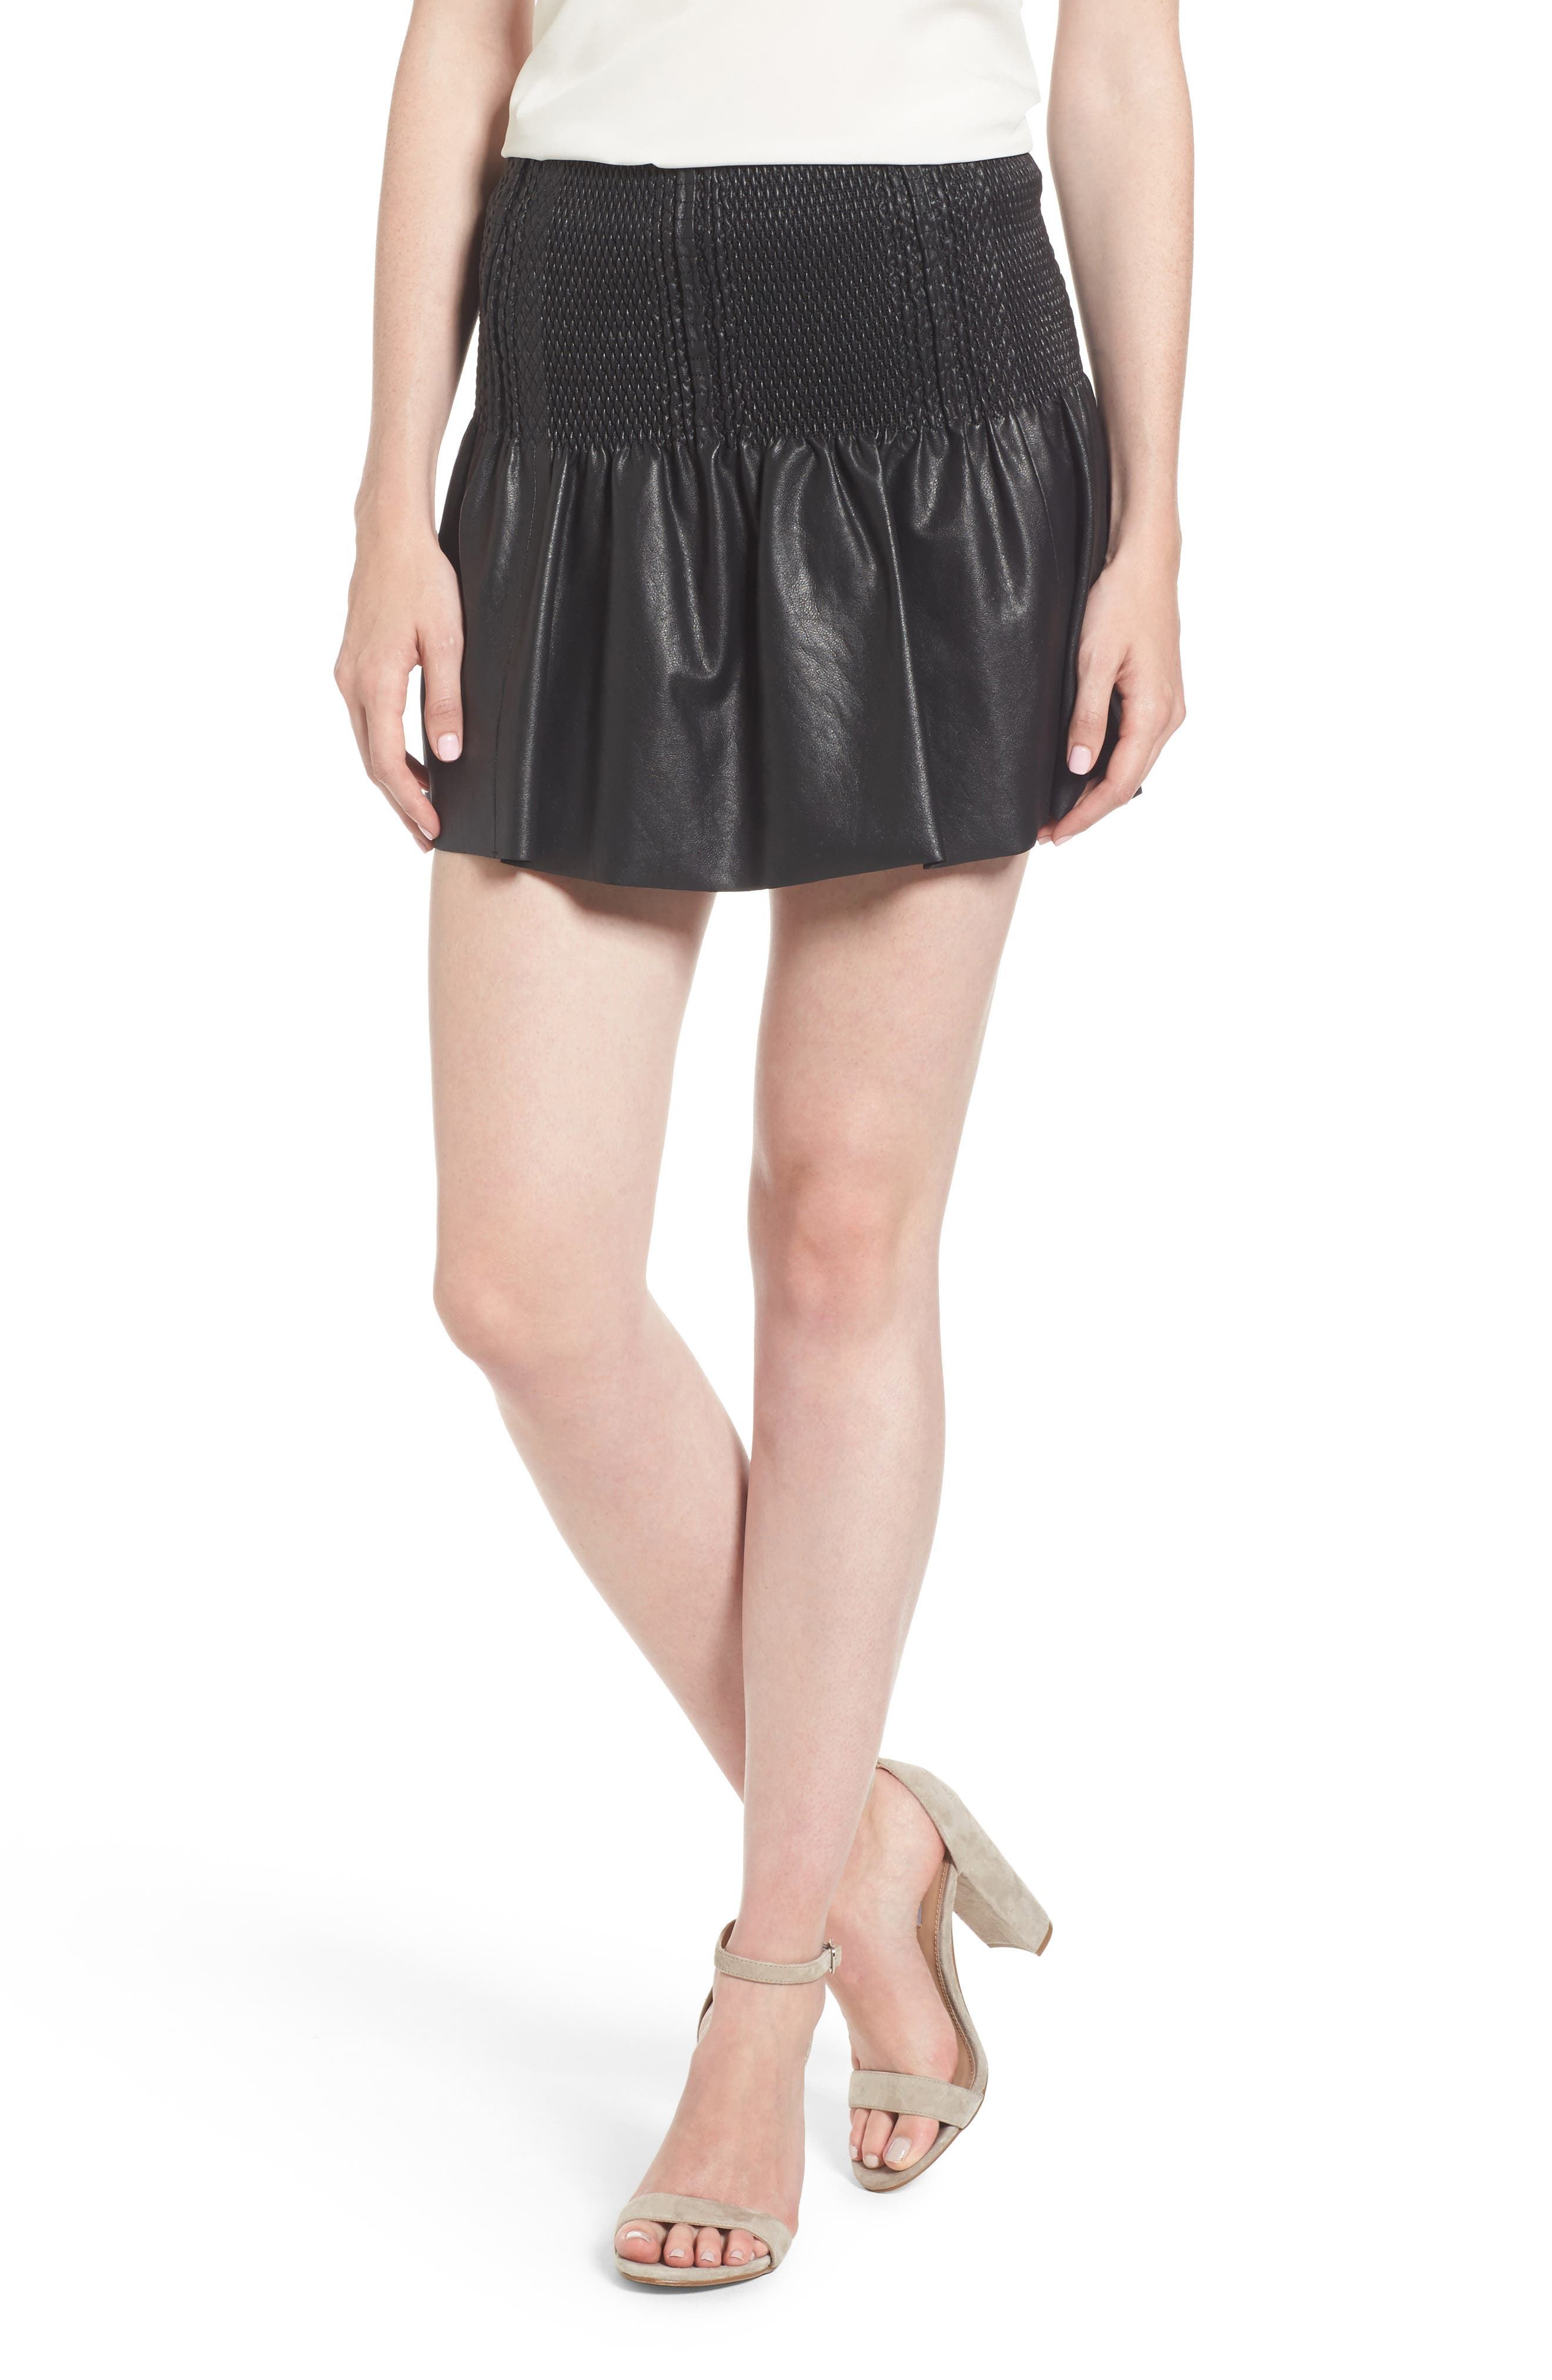 Alternate Image 1 Selected - Ella Moss Geela Smocked Skirt